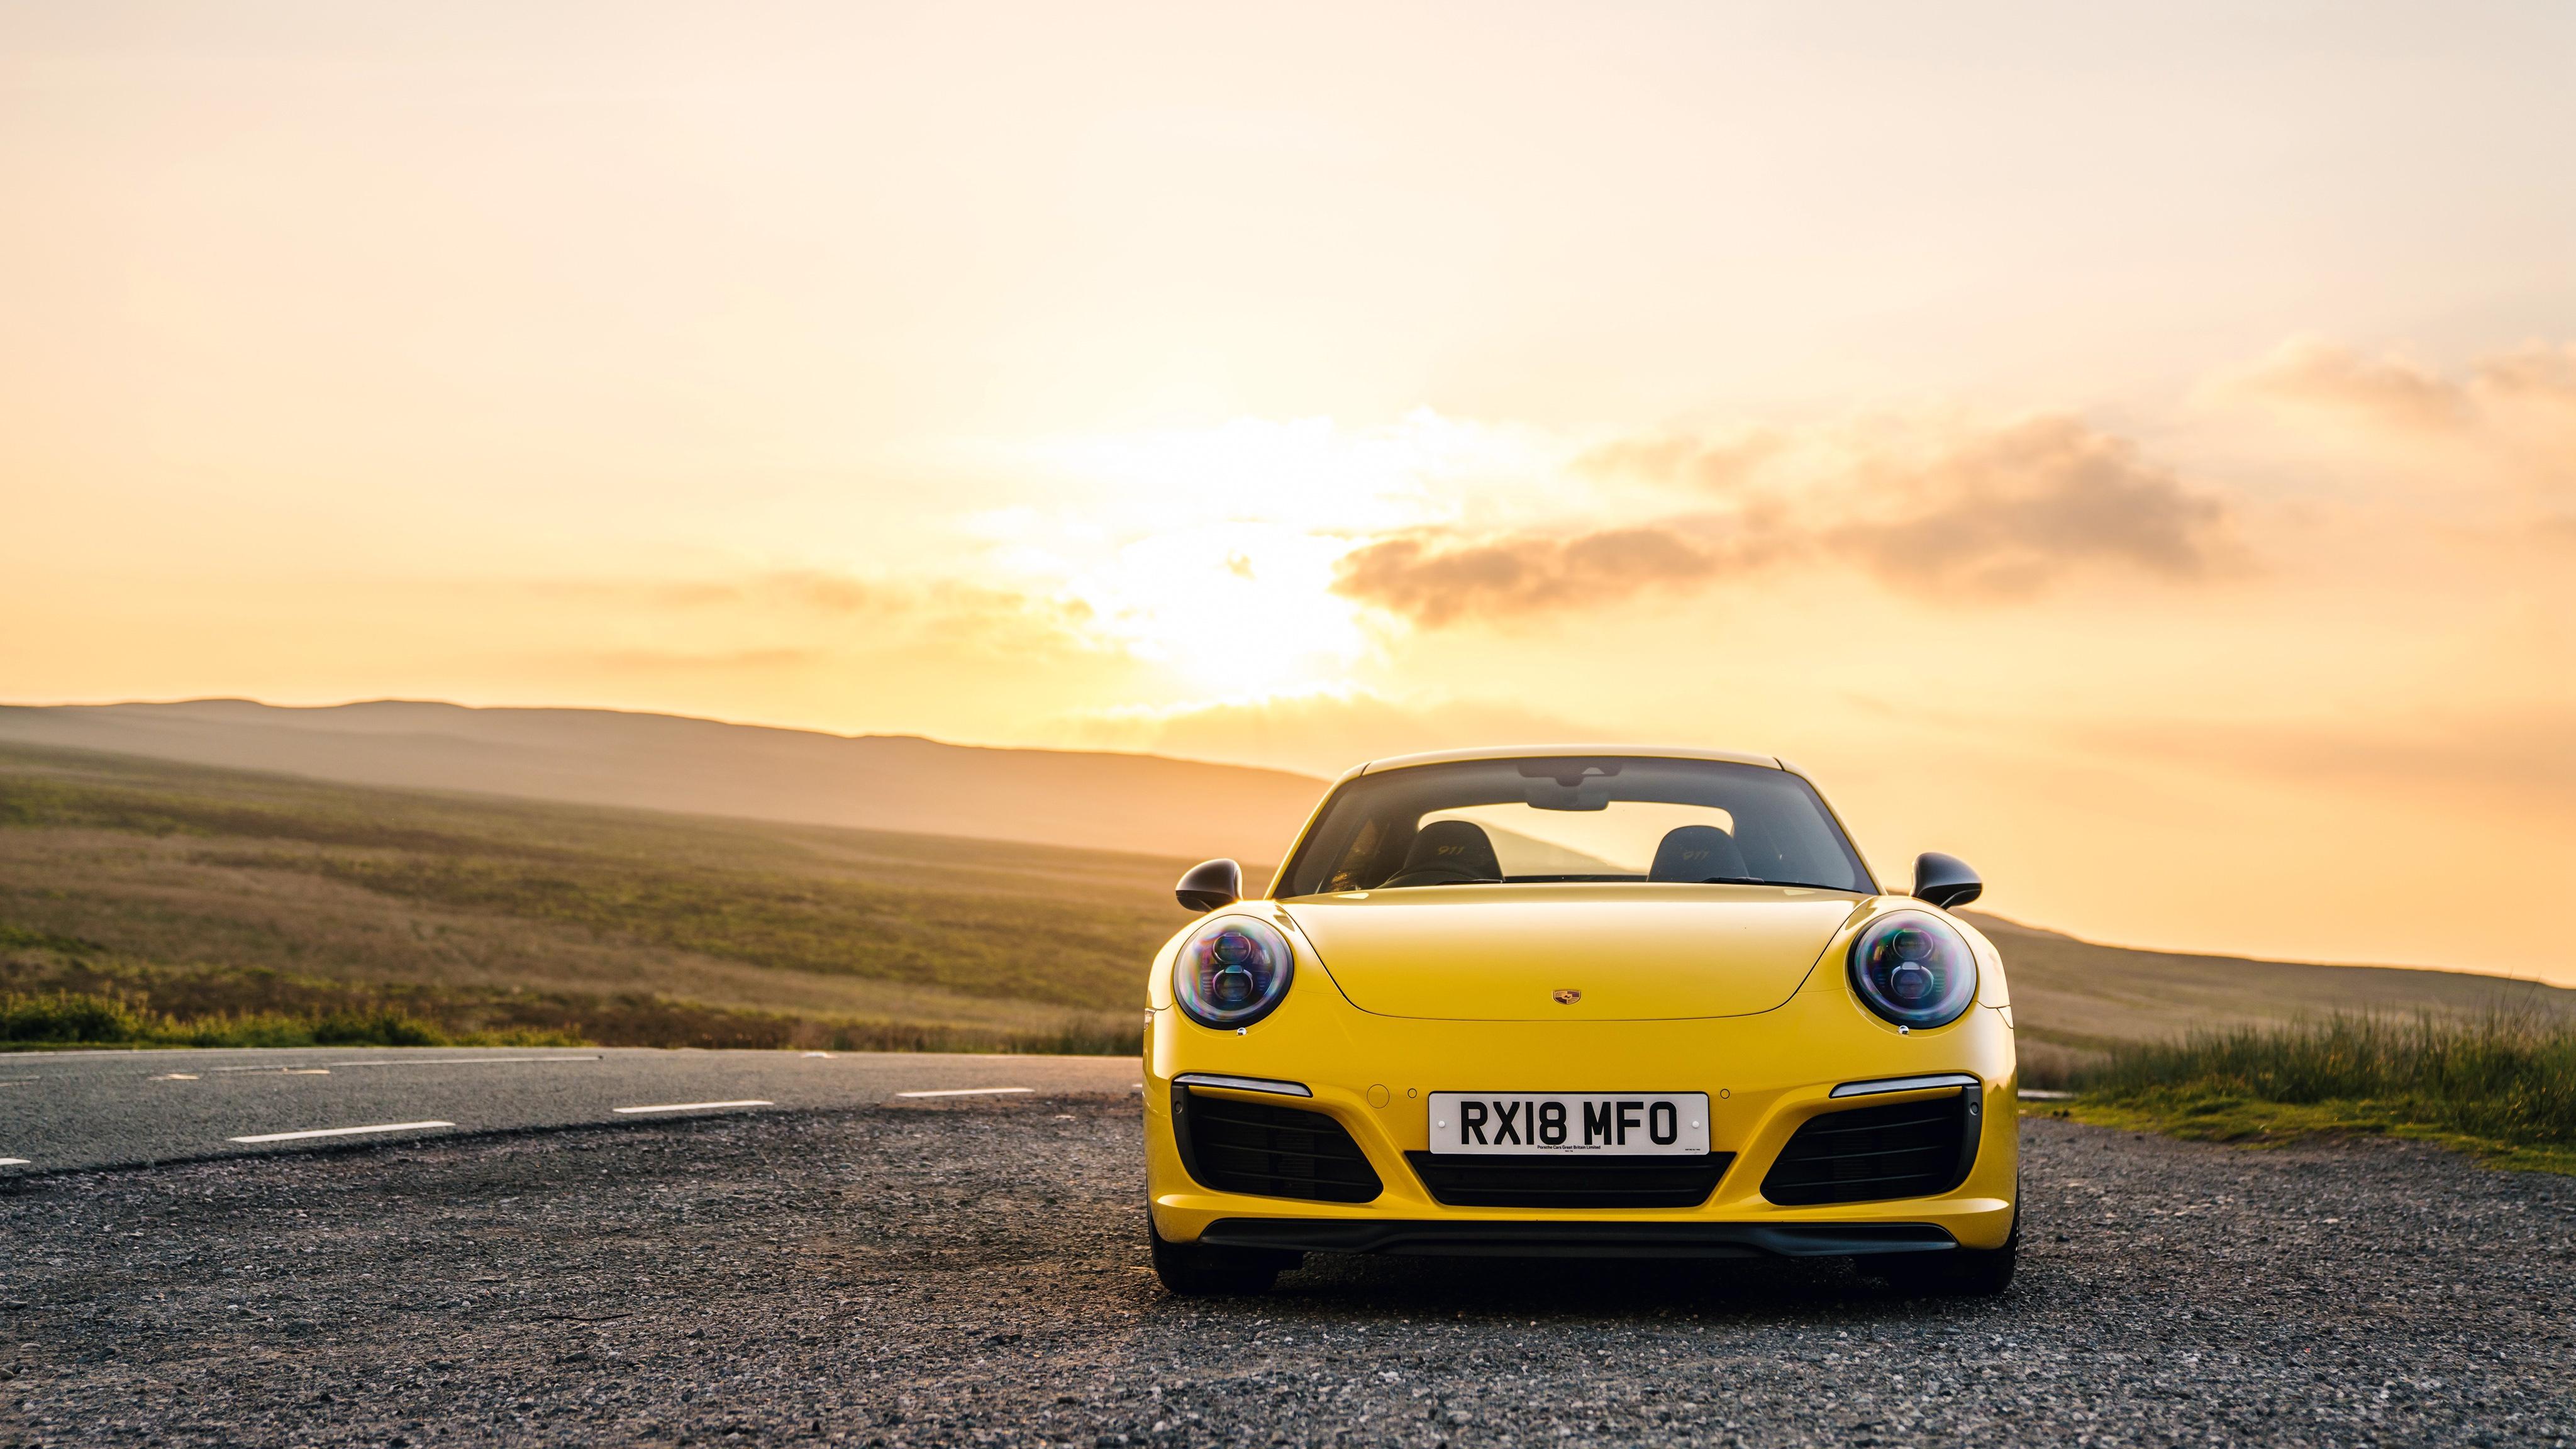 Porsche 911 Carrera T 4k Ultra Papel De Parede Hd Plano De Fundo 4096x2304 Id 937784 Wallpaper Abyss